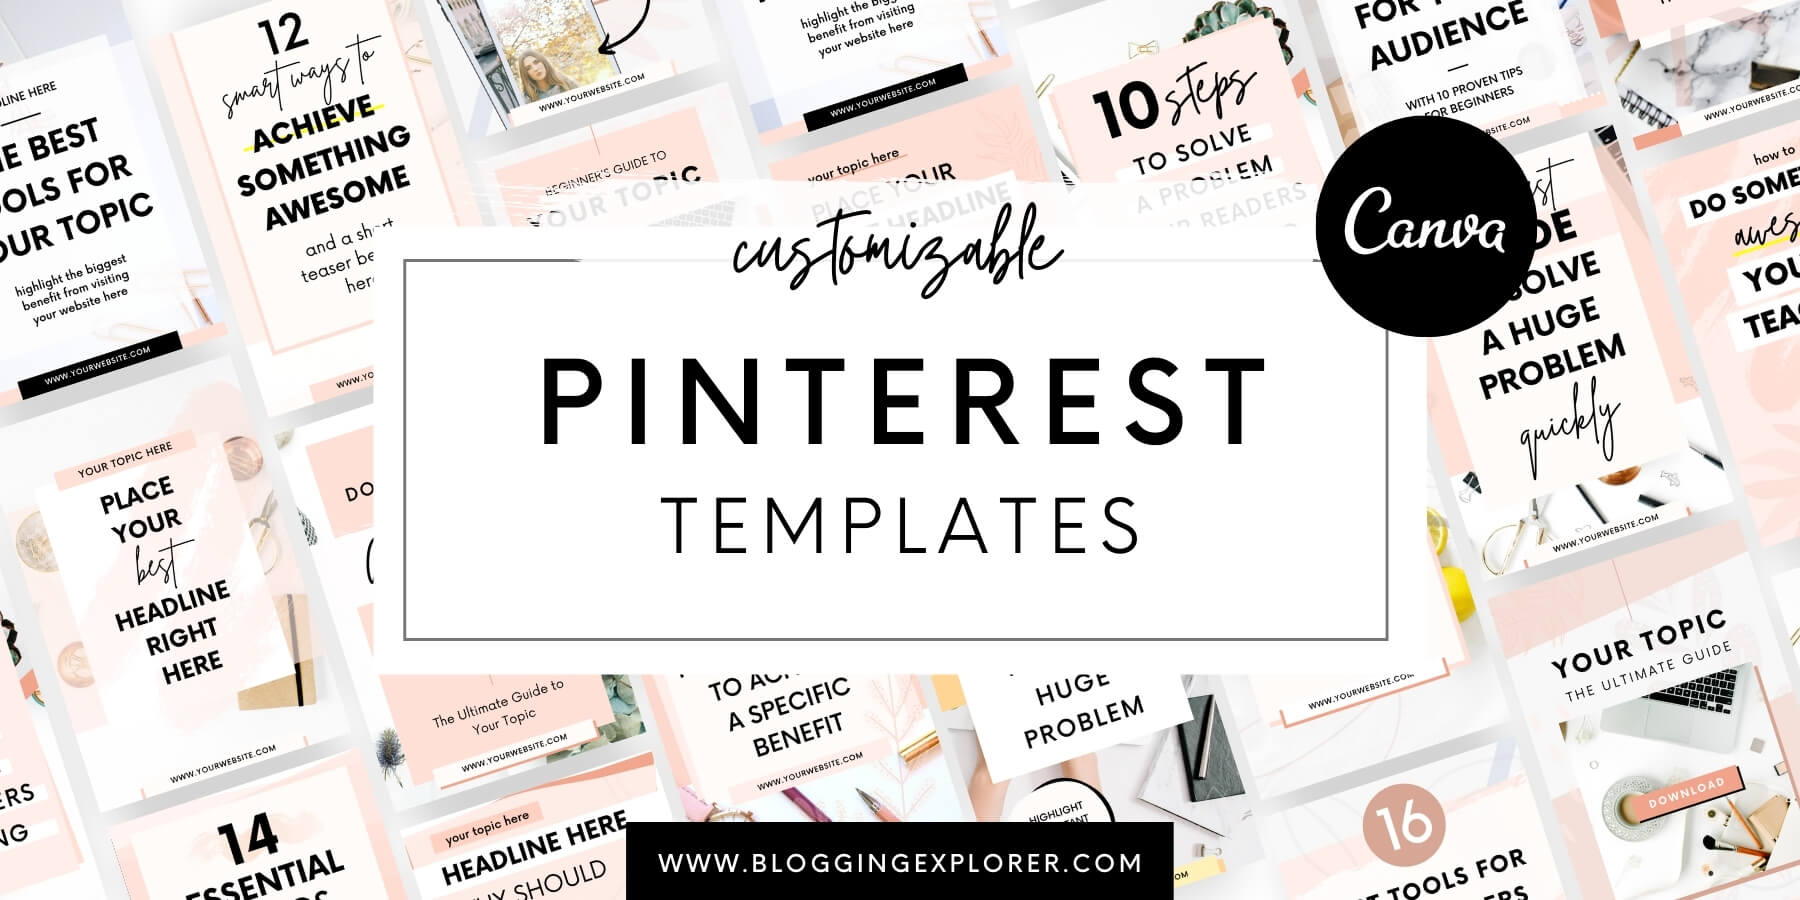 Customizable Canva Pinterest Templates for Bloggers - Blogging Explorer